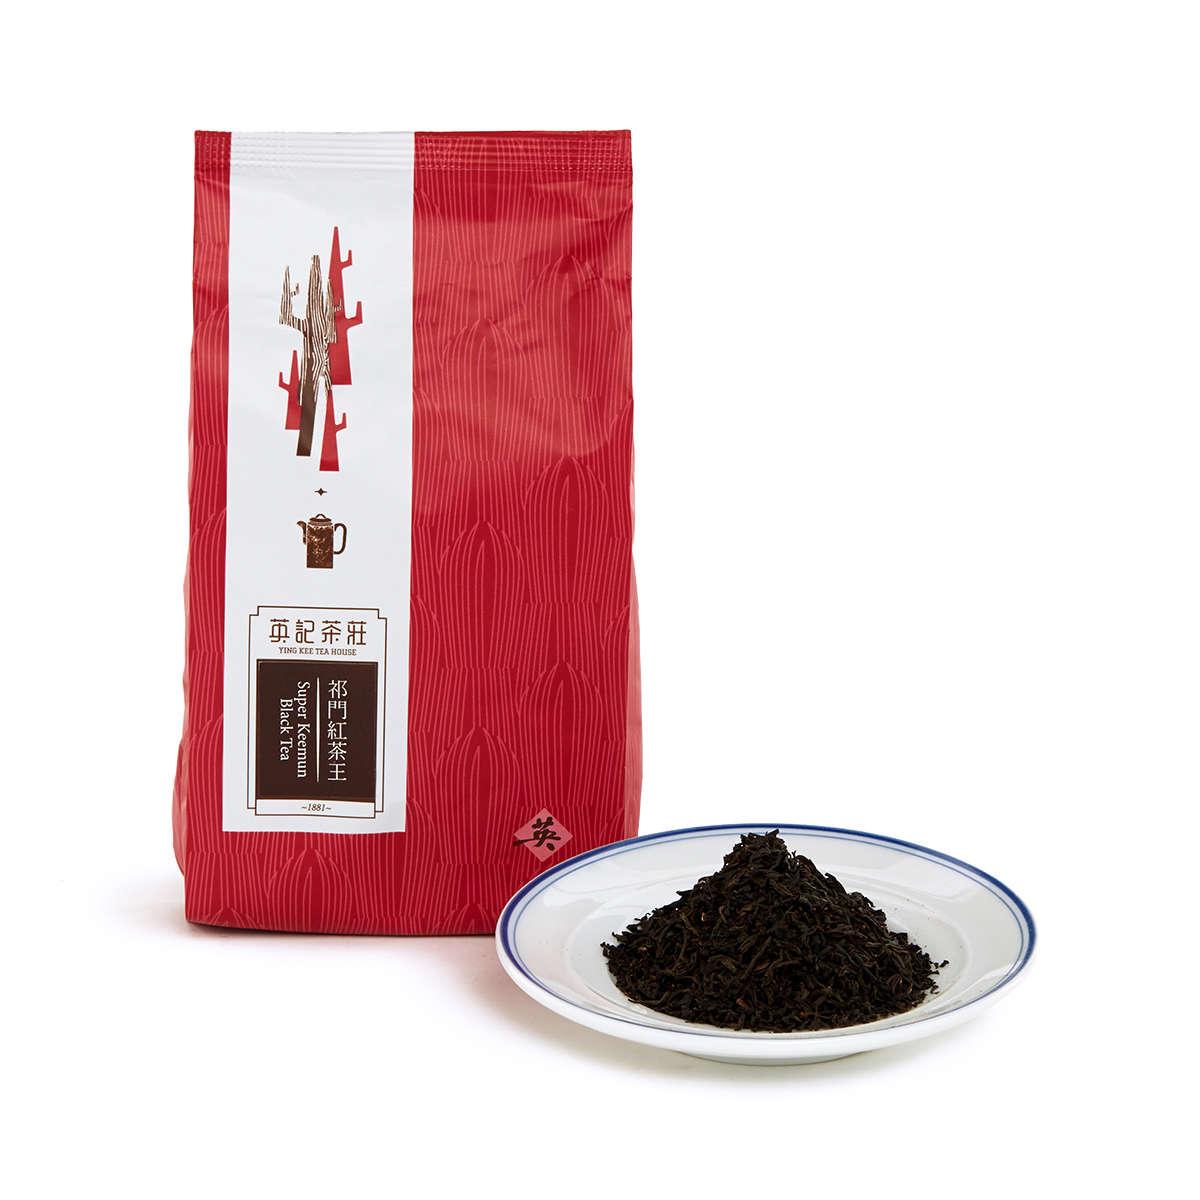 Super Keemun Black Tea (150g/bag)